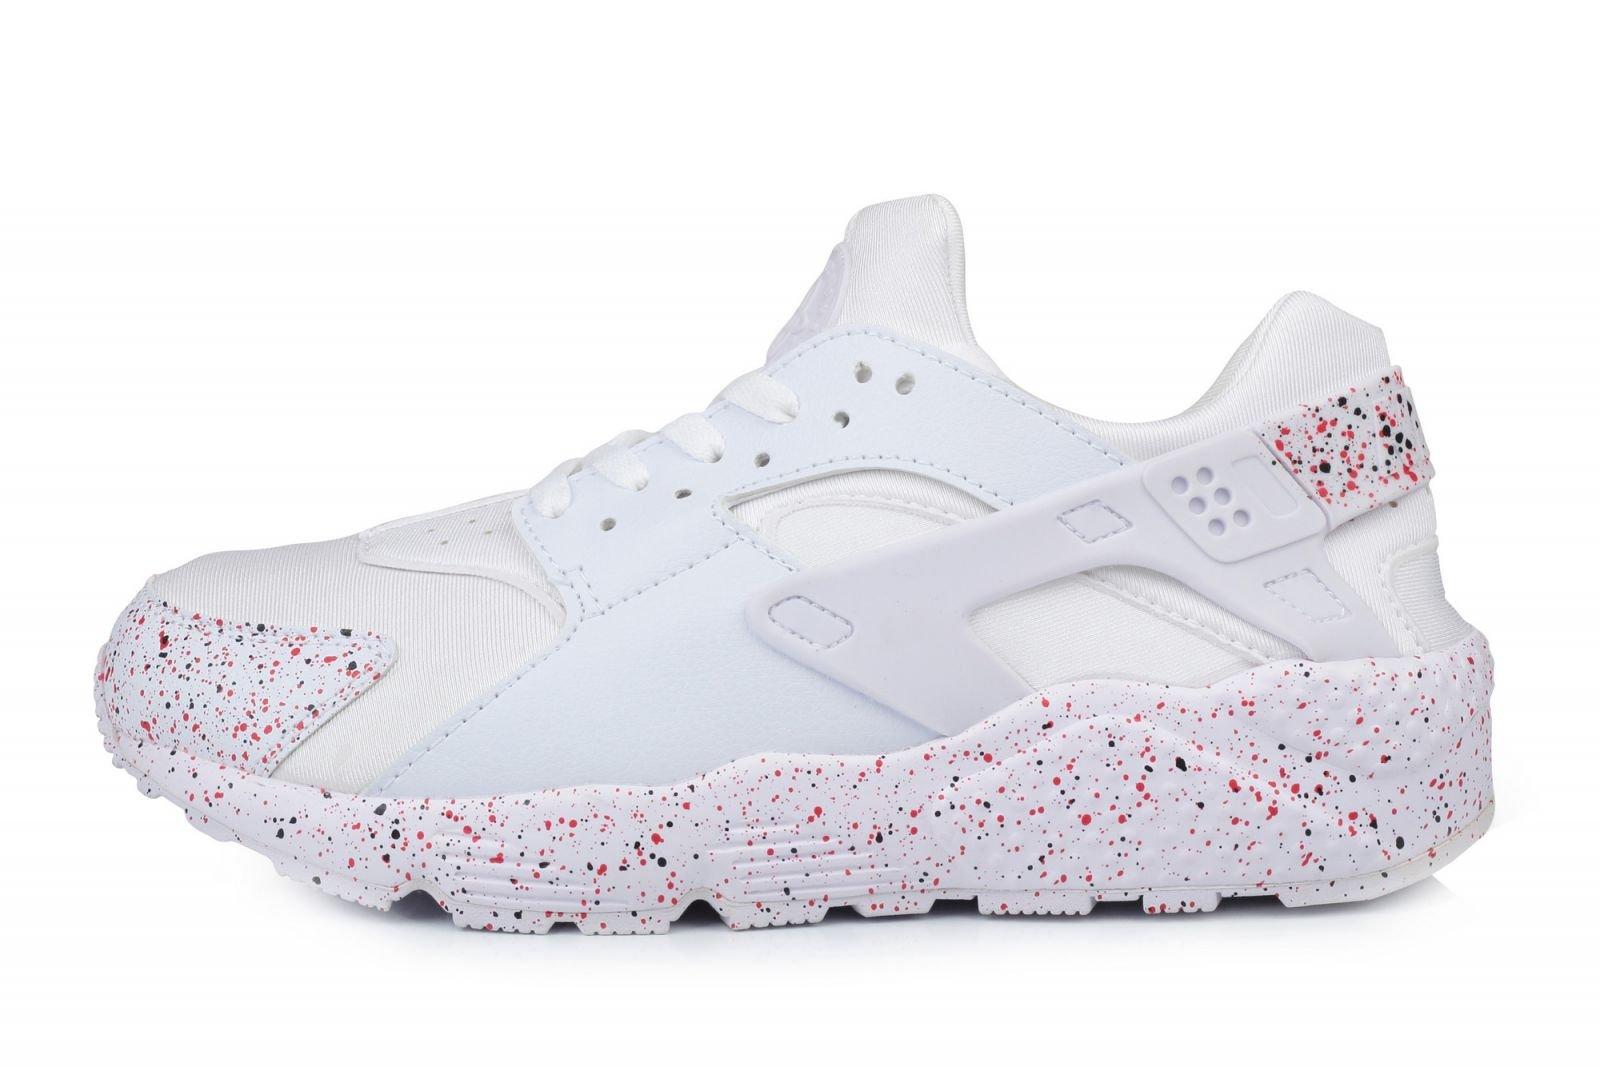 ca404ef4 Купить Кроссовки Nike Huarache в Киеве: цена, фото - Интернет ...